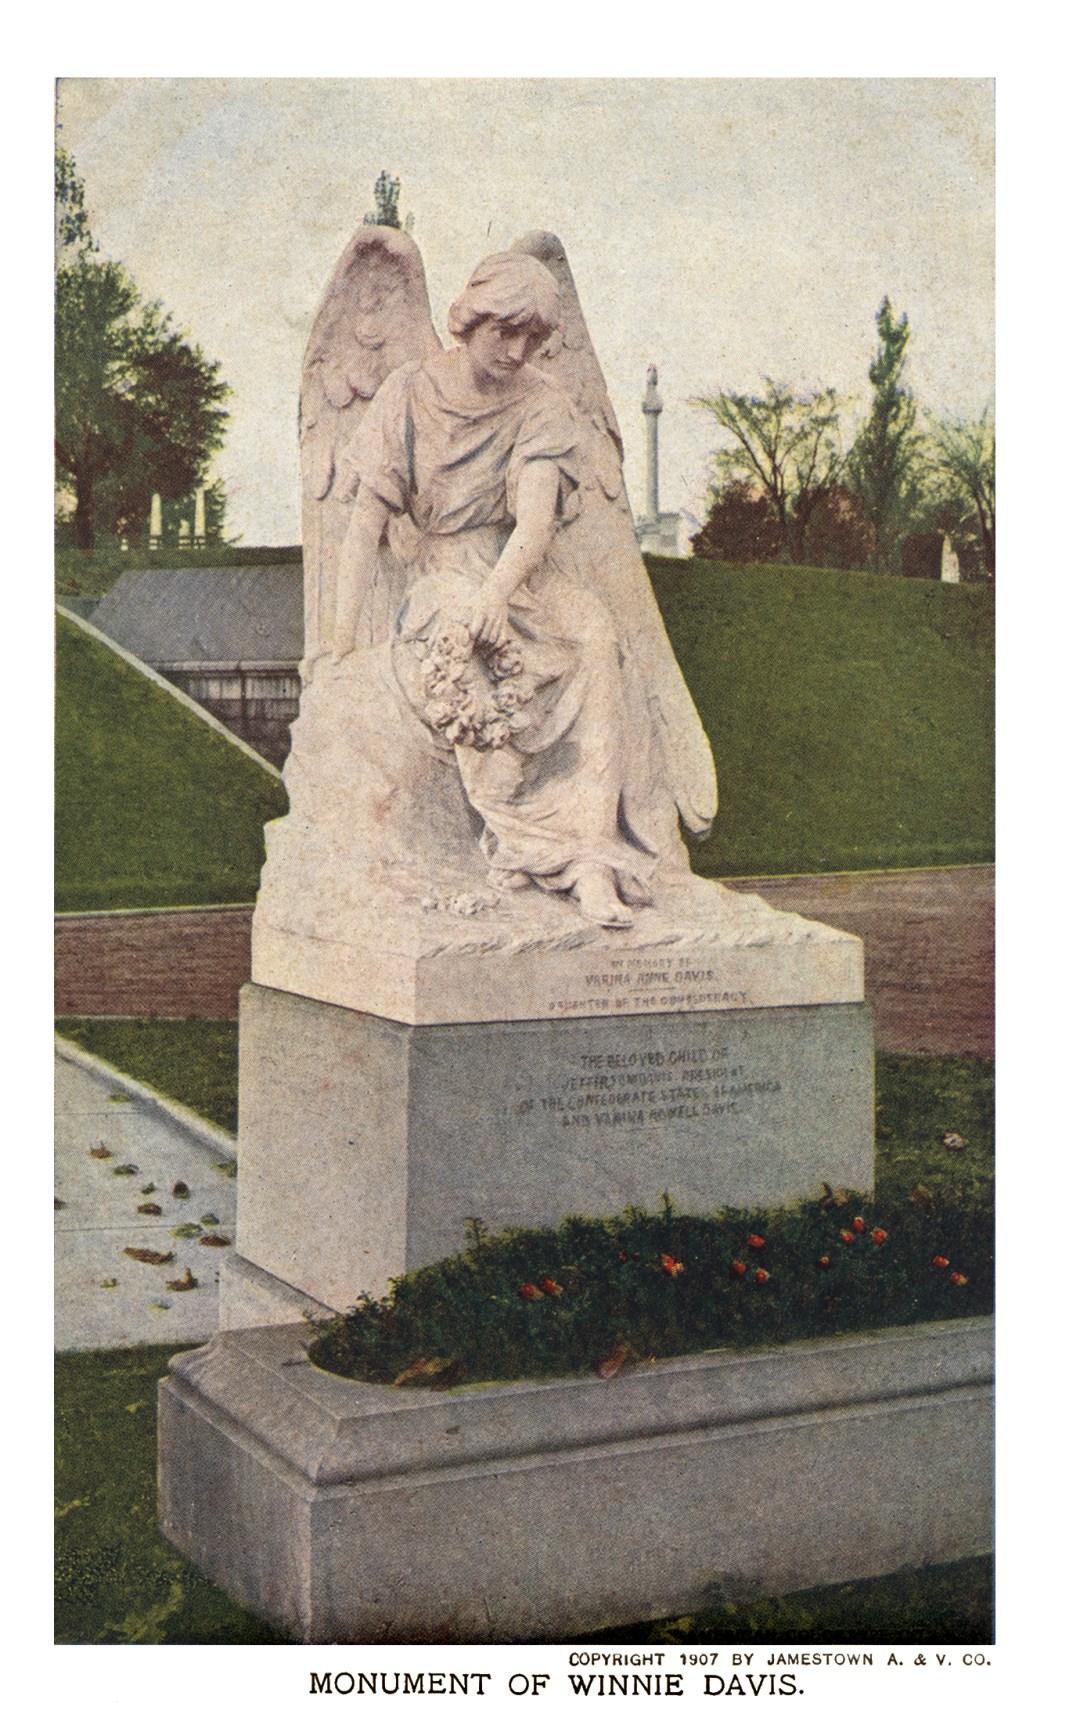 06PCJamestown Exposition00220 - Winnie Davis Monument copy